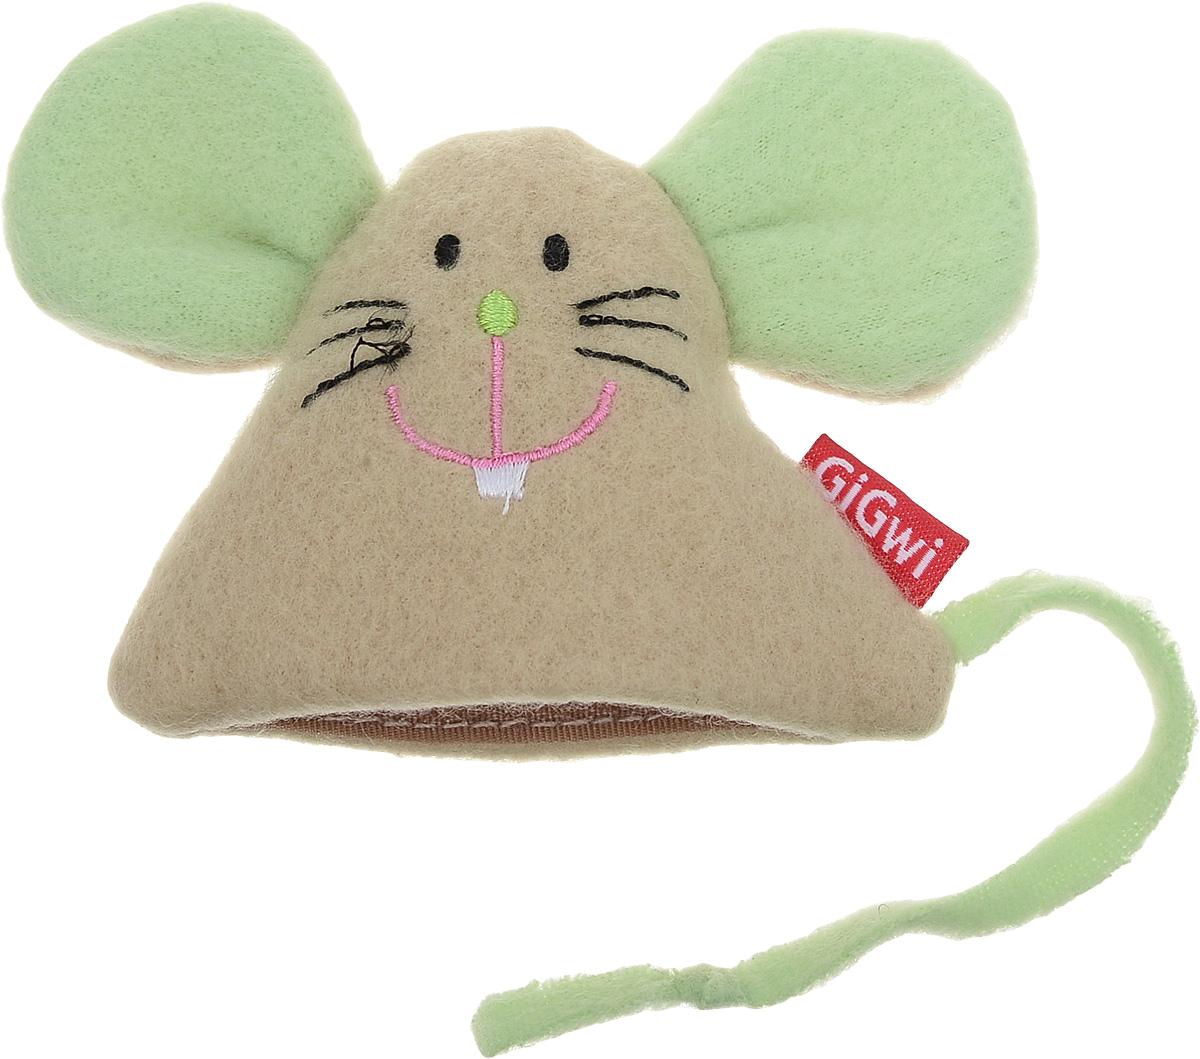 Игрушка для кошек GiGwi Мышка, с кошачьей мятой, 9 х 8,5 см электронная игрушка для кошек gigwi pet droid фезер воблер